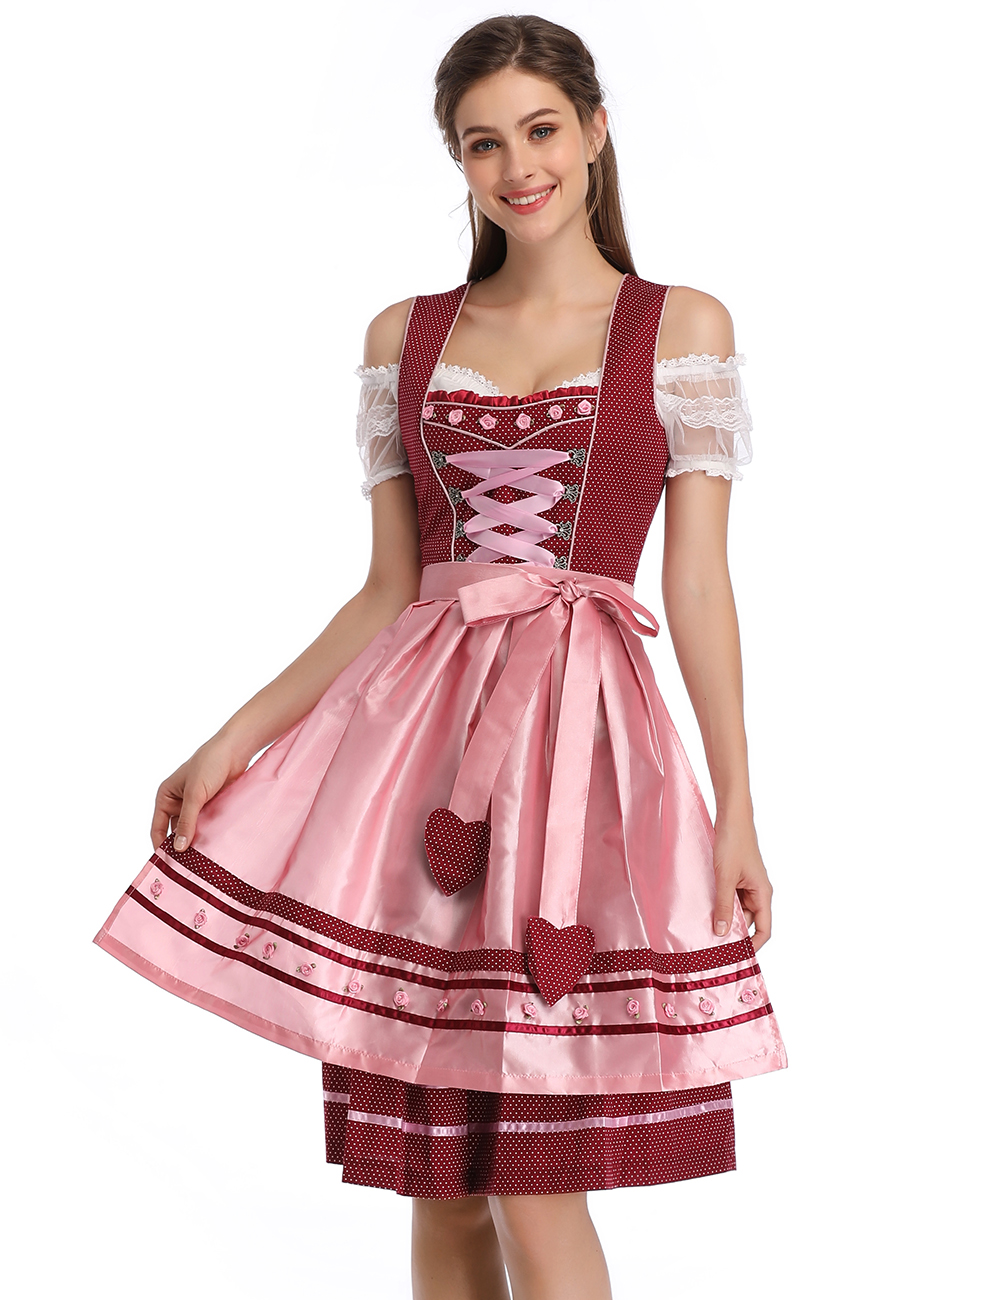 Kojooin Women's Traditional German Dirndl Dress for Bavarian Oktoberfest Party Festival Halloween Carnival